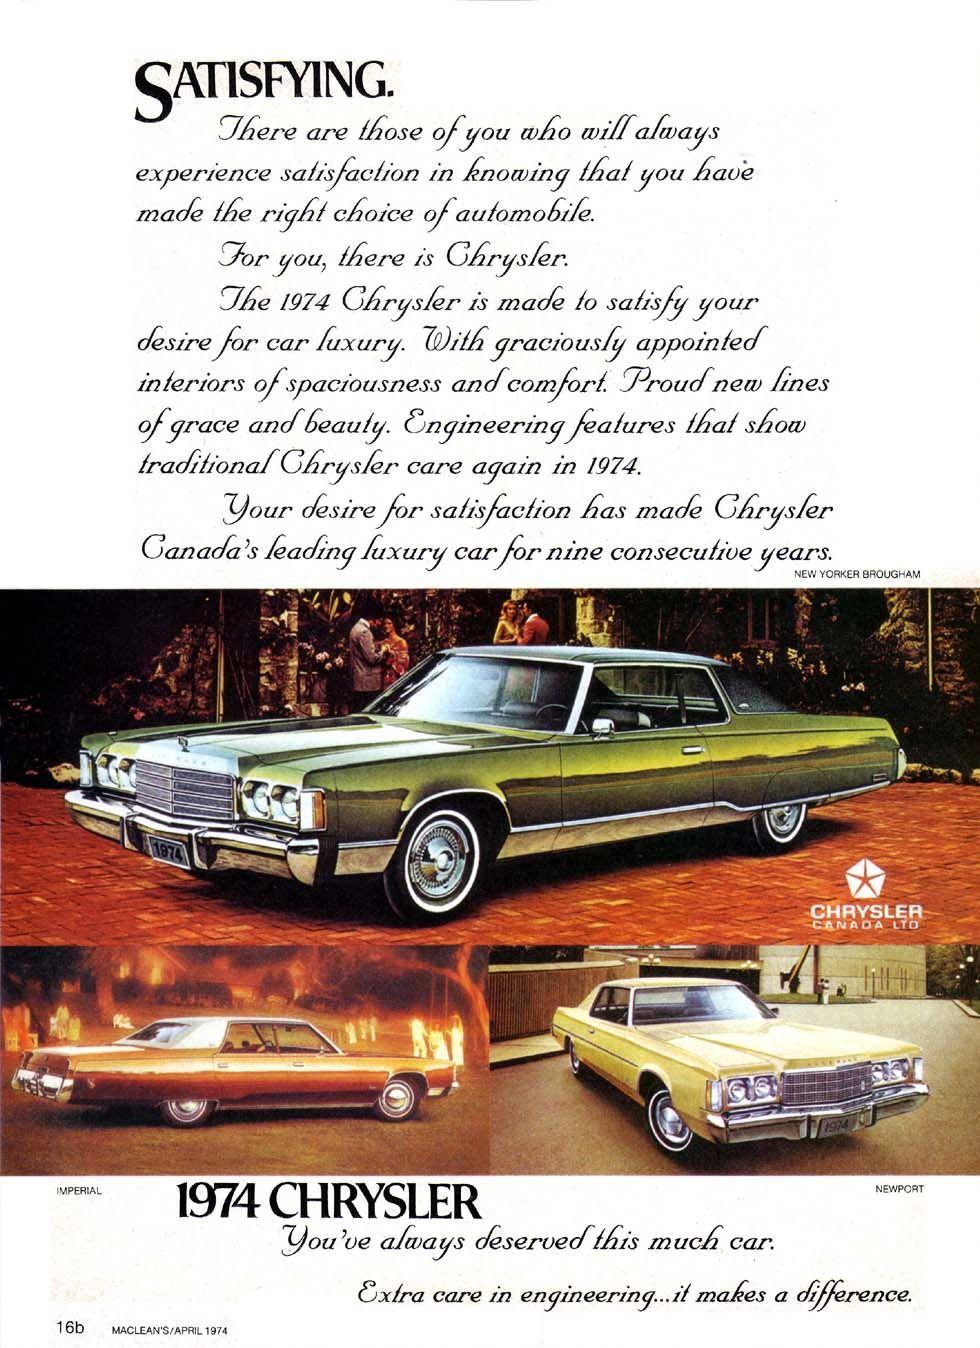 1974 chrysler new york brougham imperial newport luxury ad